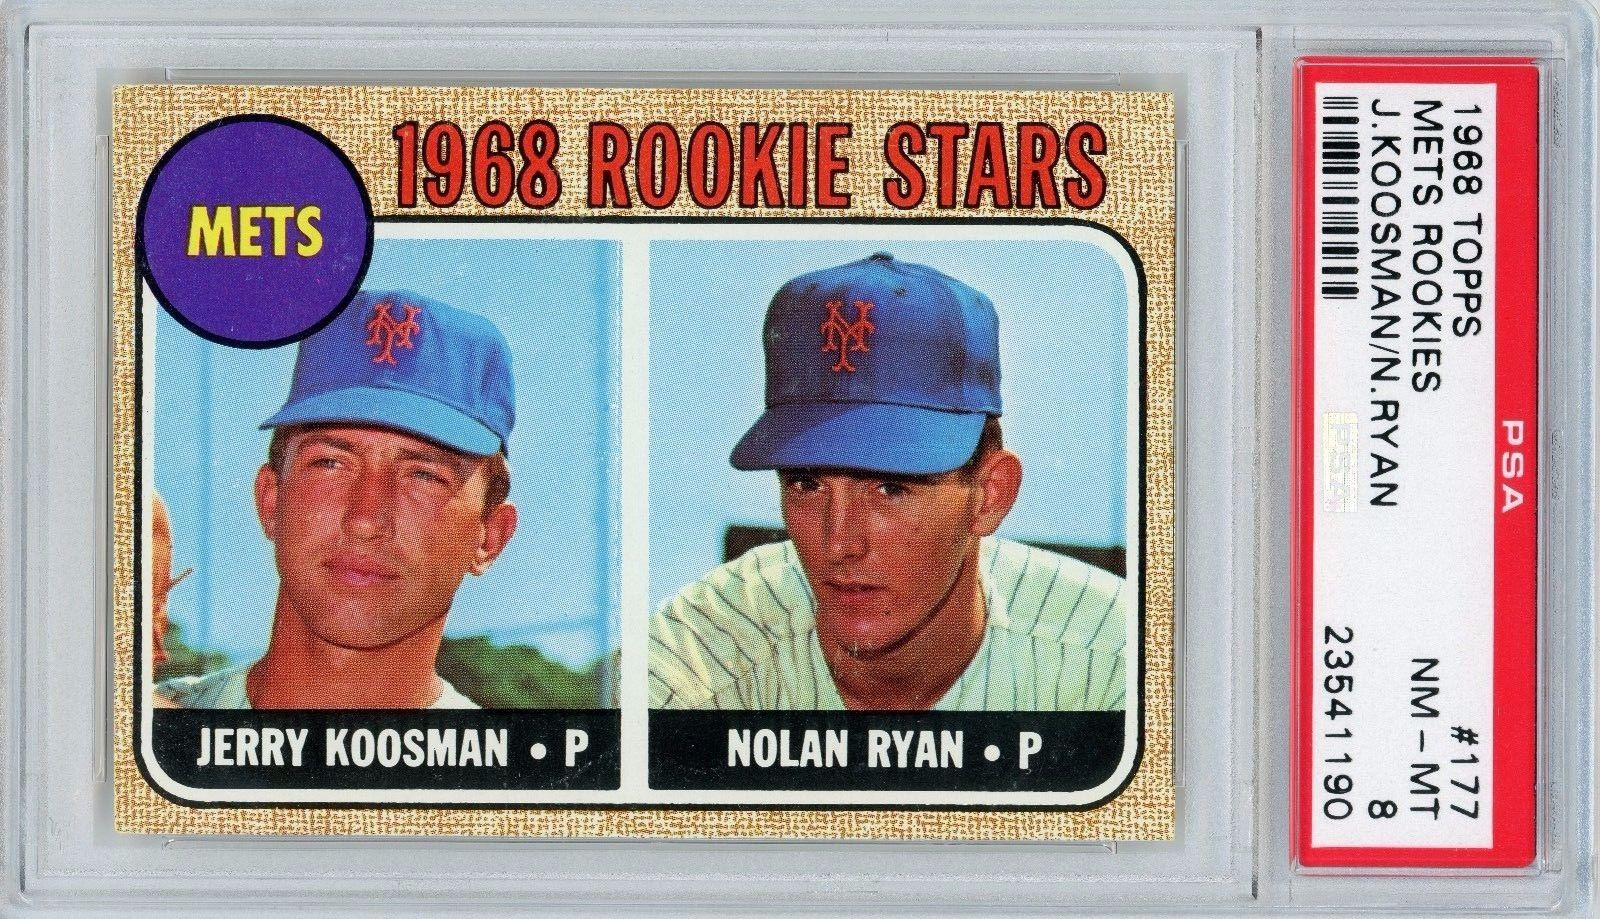 1968 Topps Nolan Ryan 177 RC PSA NMMT 8 Sharp  Centered w 85 Potential